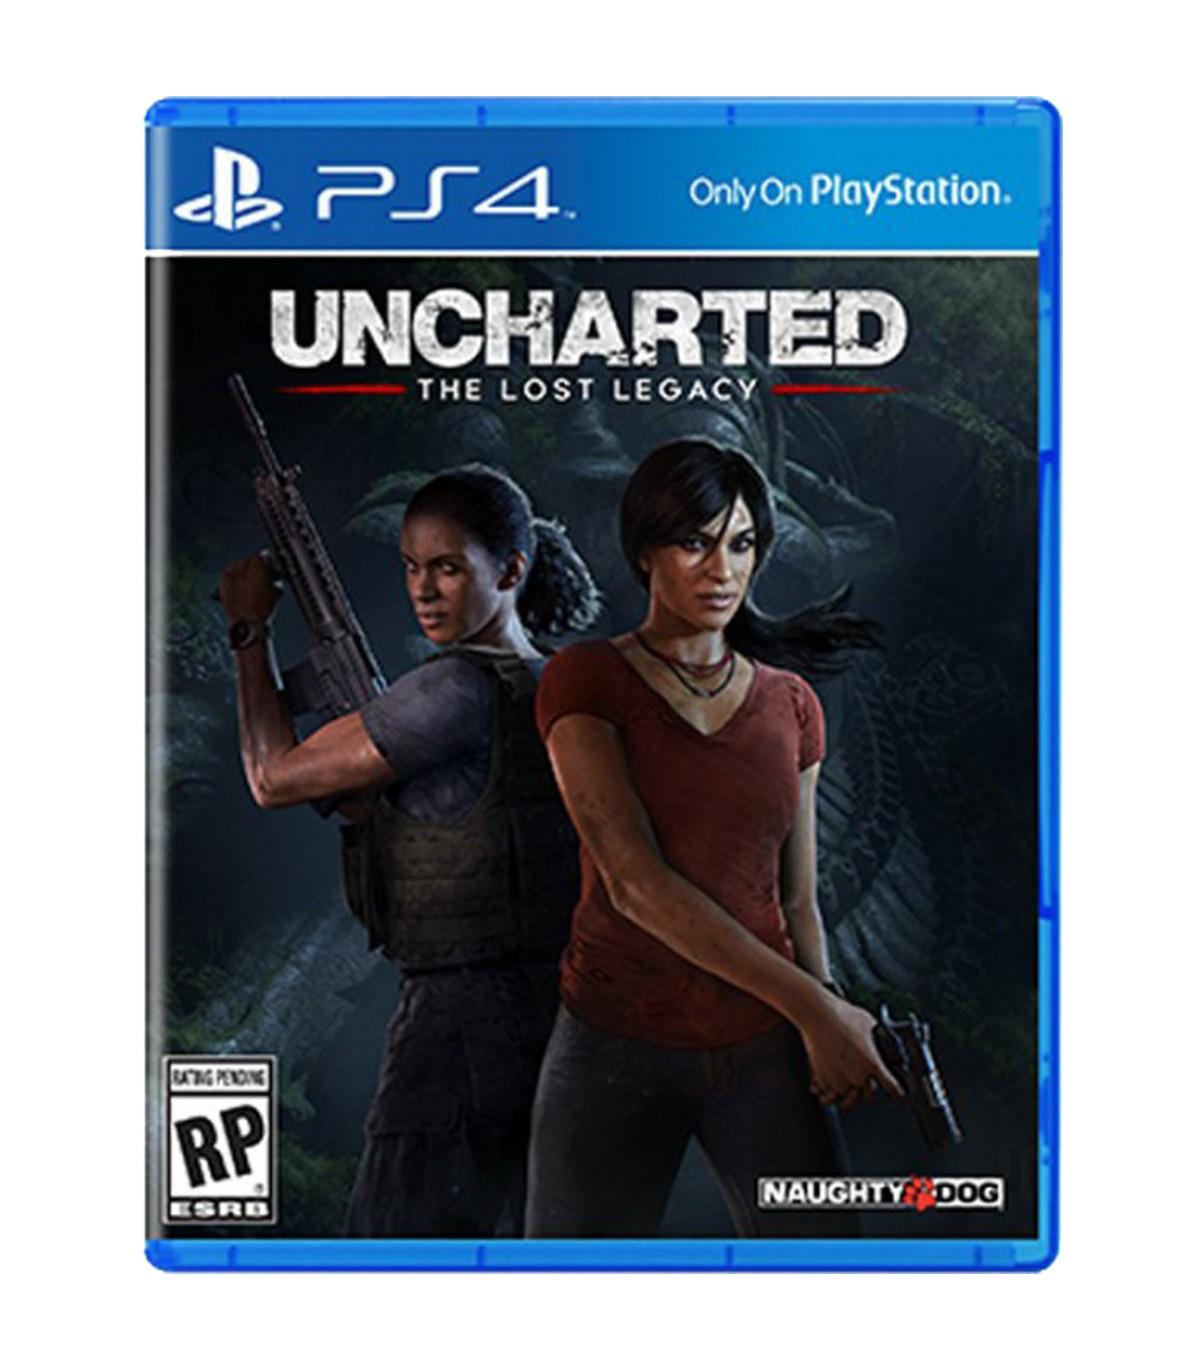 بازی Uncharted: The Lost Legacy کارکرده - پلی استیشن 4